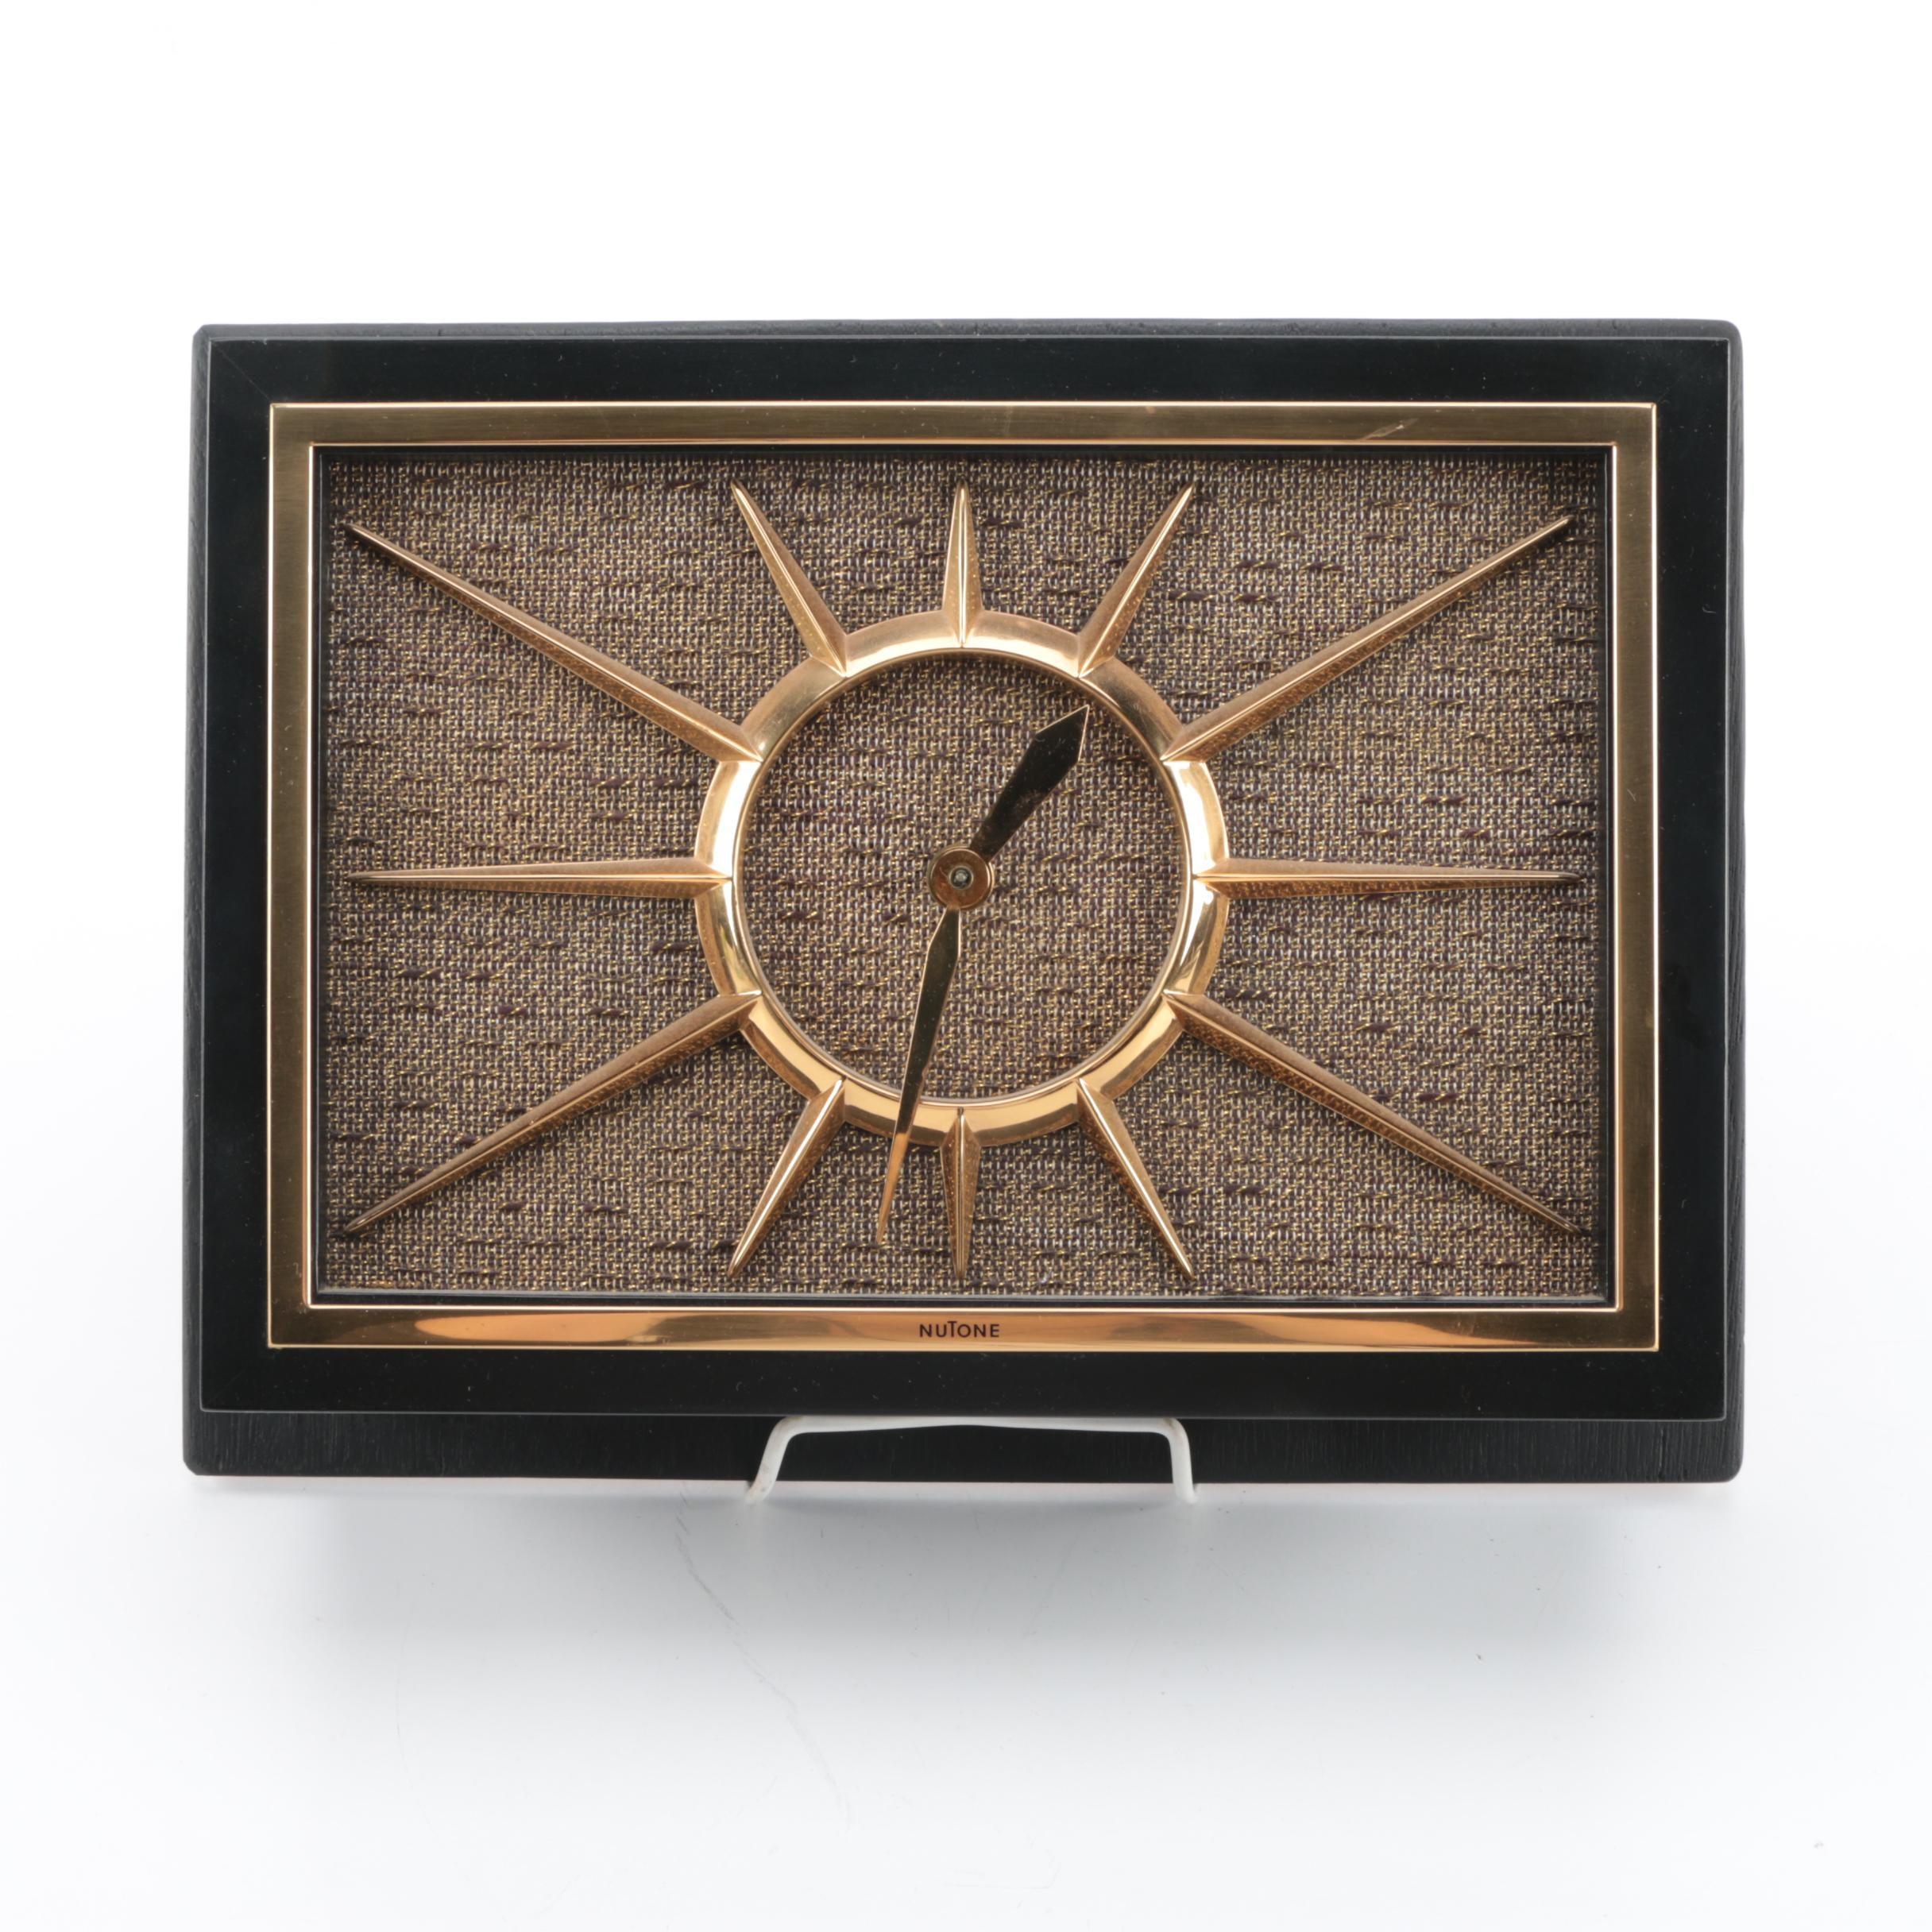 NuTone Mid Century Modern Wall Clock and Doorbell